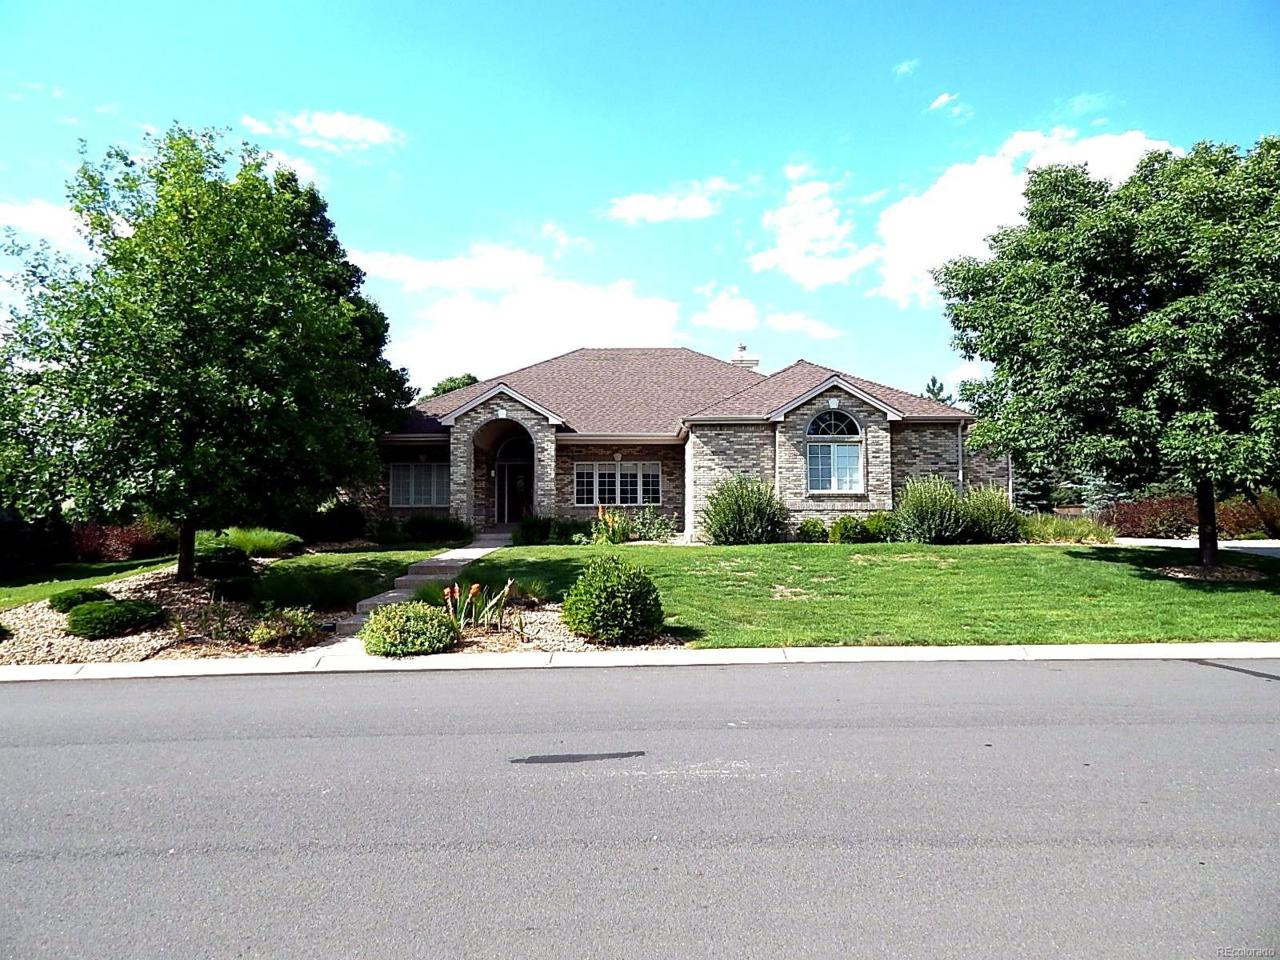 25 Blue Heron Drive, Thornton, CO 80241 (MLS #6155015) :: 8z Real Estate